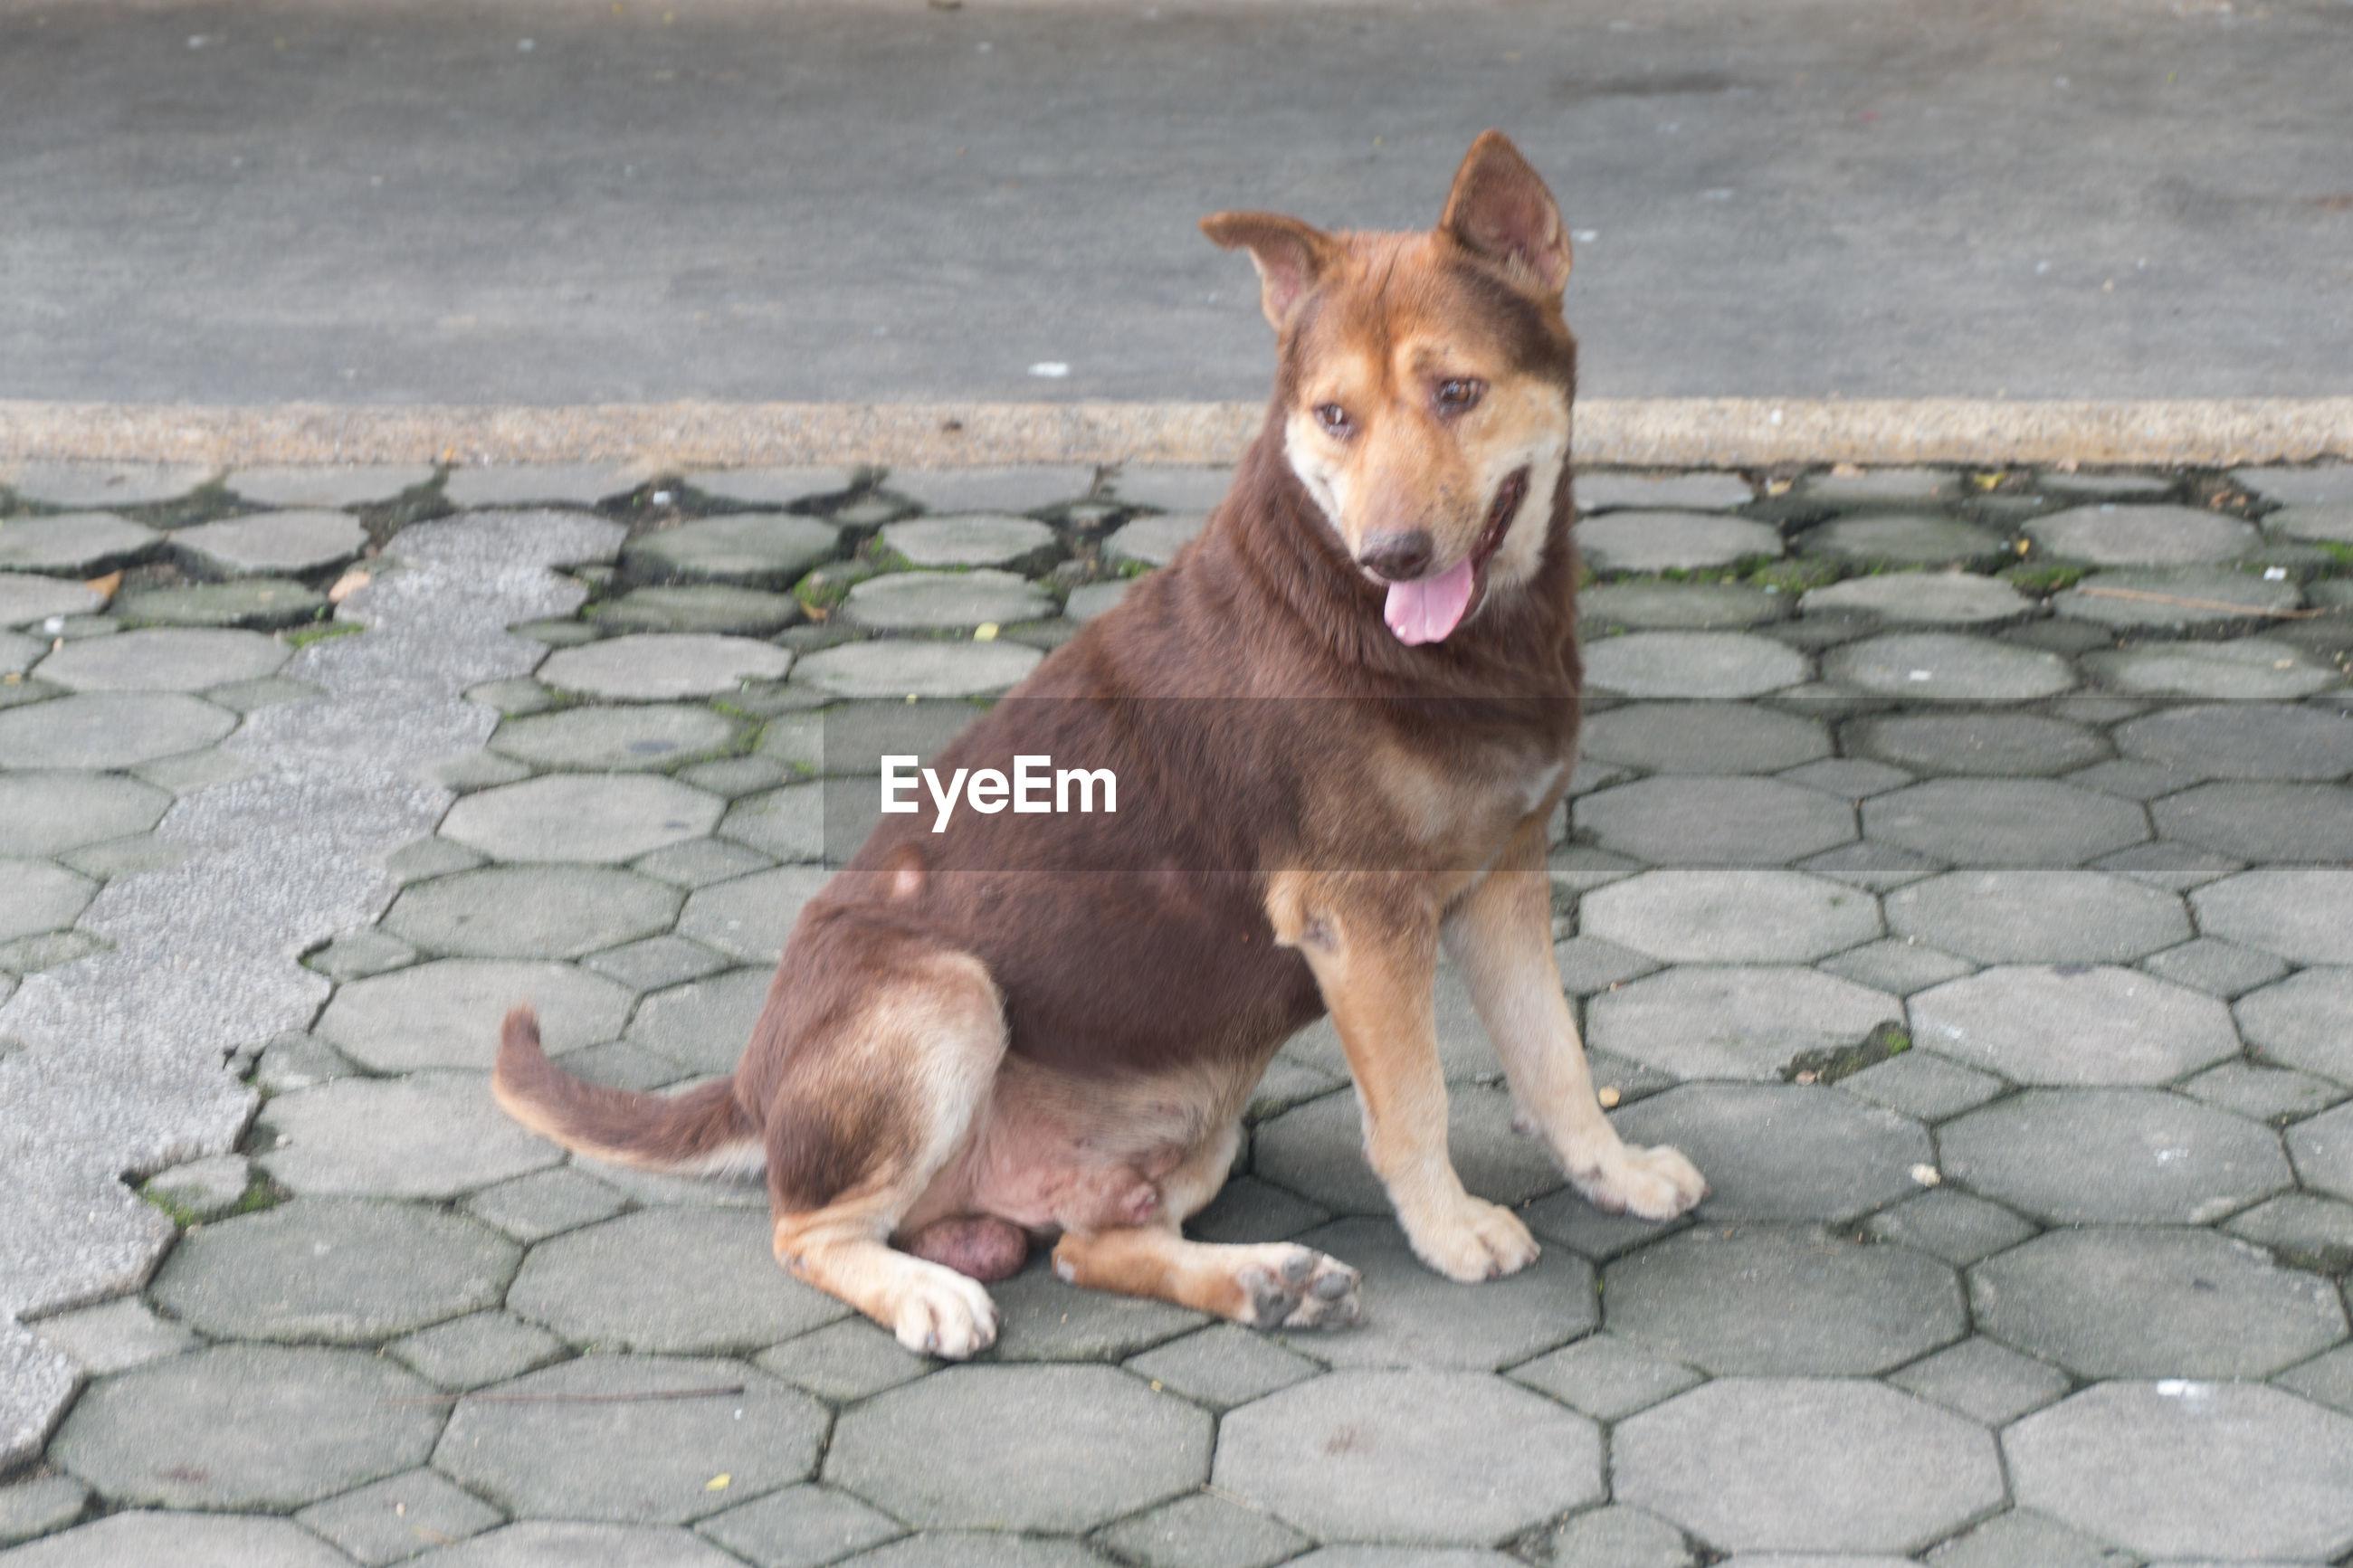 VIEW OF DOG IN COBBLESTONE